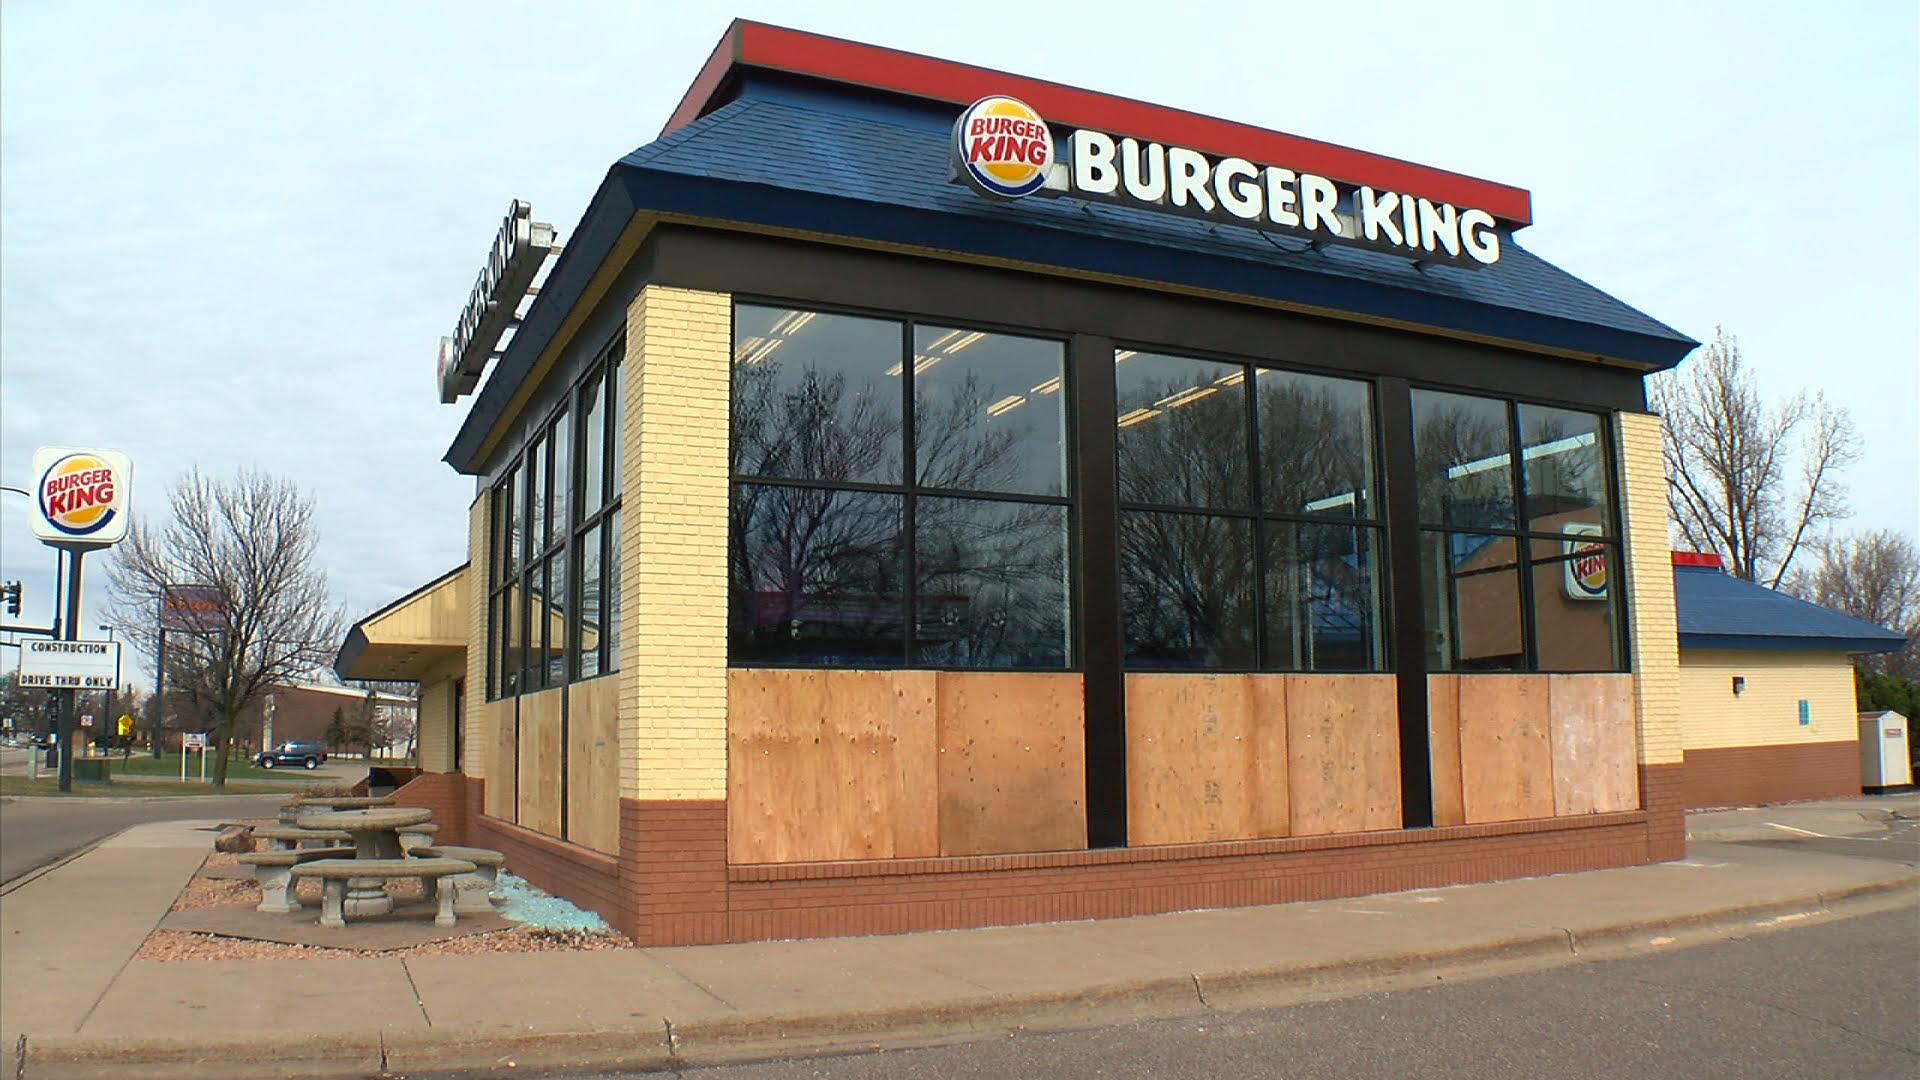 coon-rapids-burger-king-employees-break-windows-after-prank-call